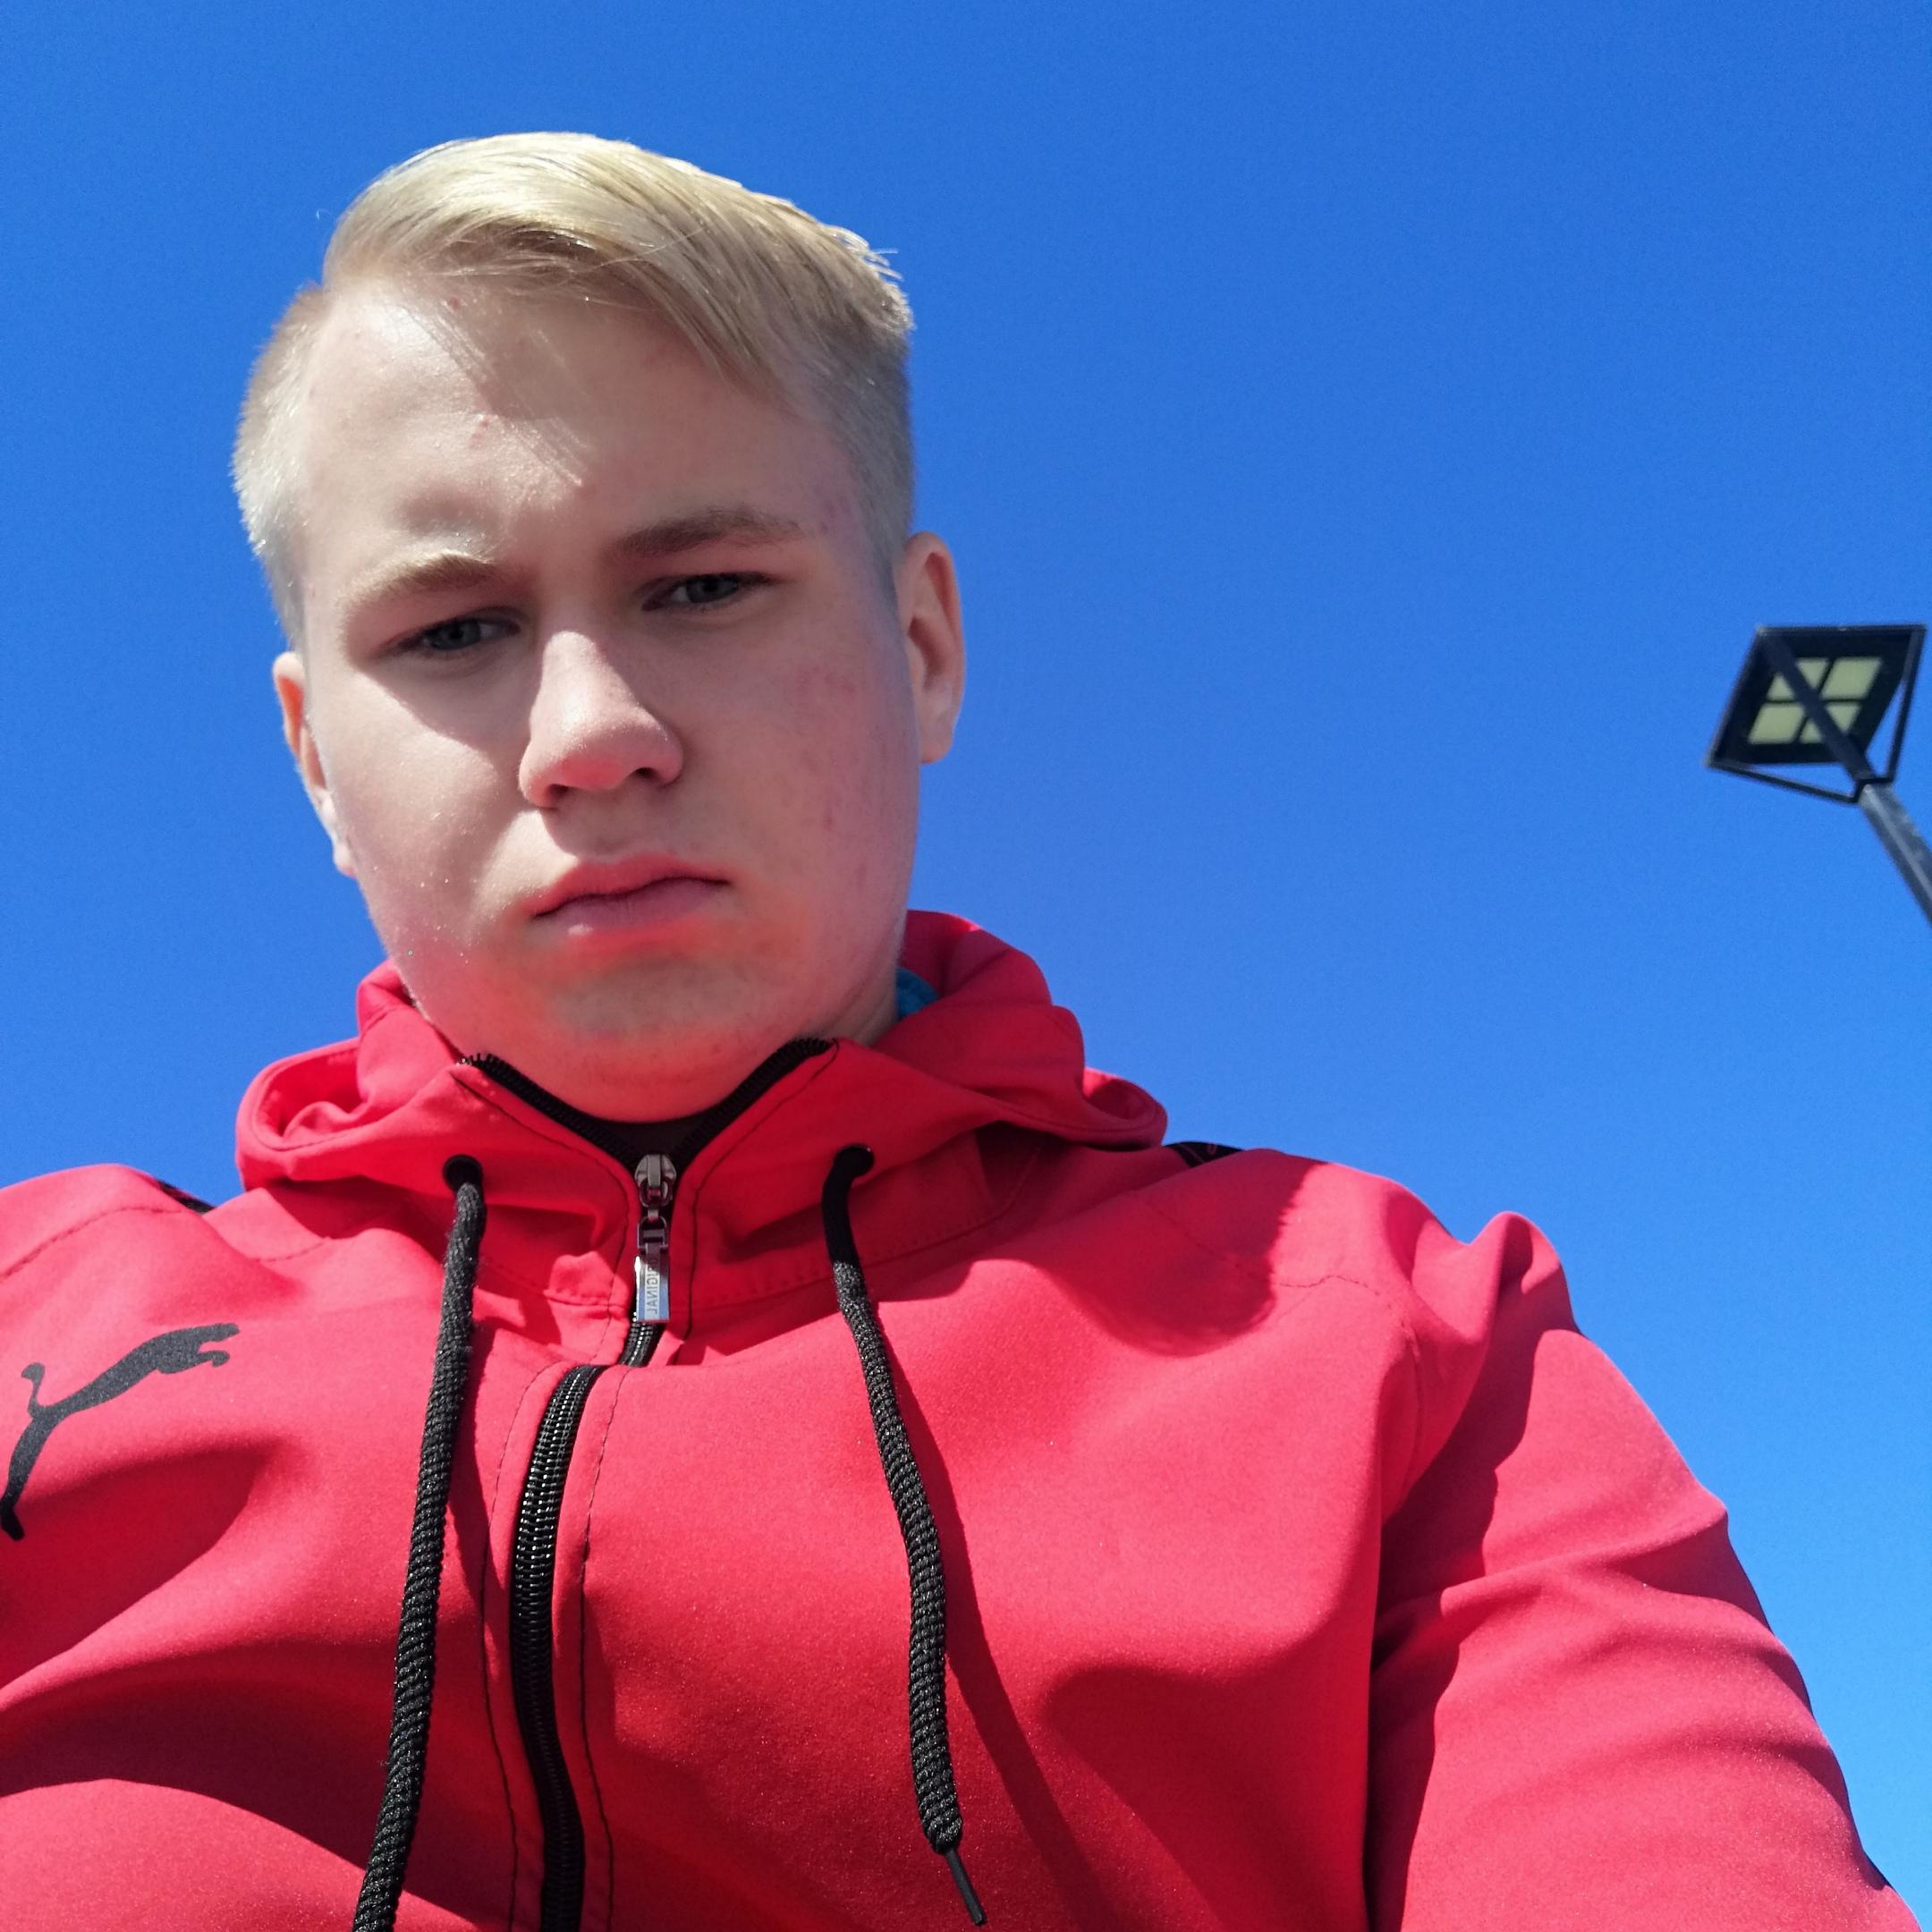 Максим, 18, Mishelevka